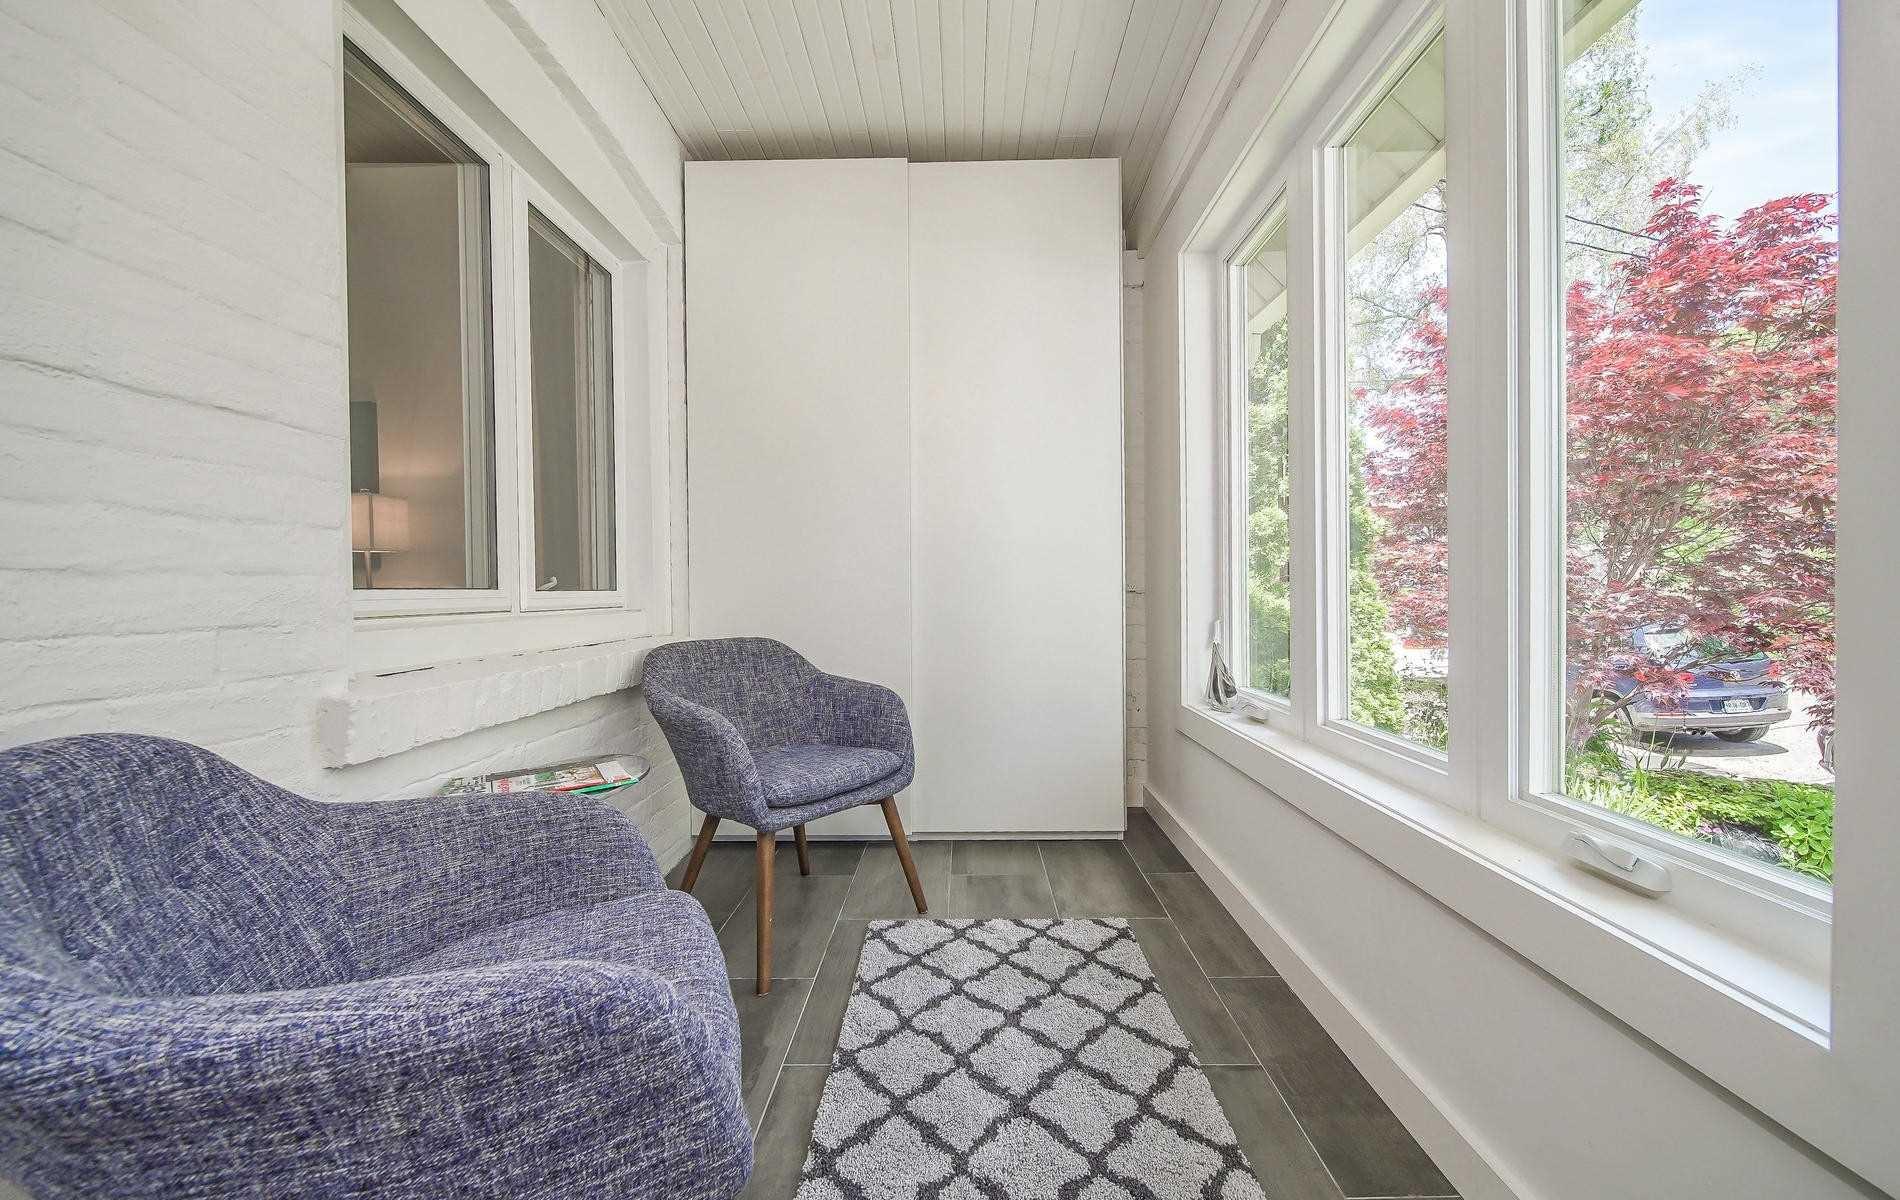 Photo 2: Photos: 64 Larchmount Avenue in Toronto: South Riverdale House (2-Storey) for sale (Toronto E01)  : MLS®# E4489752